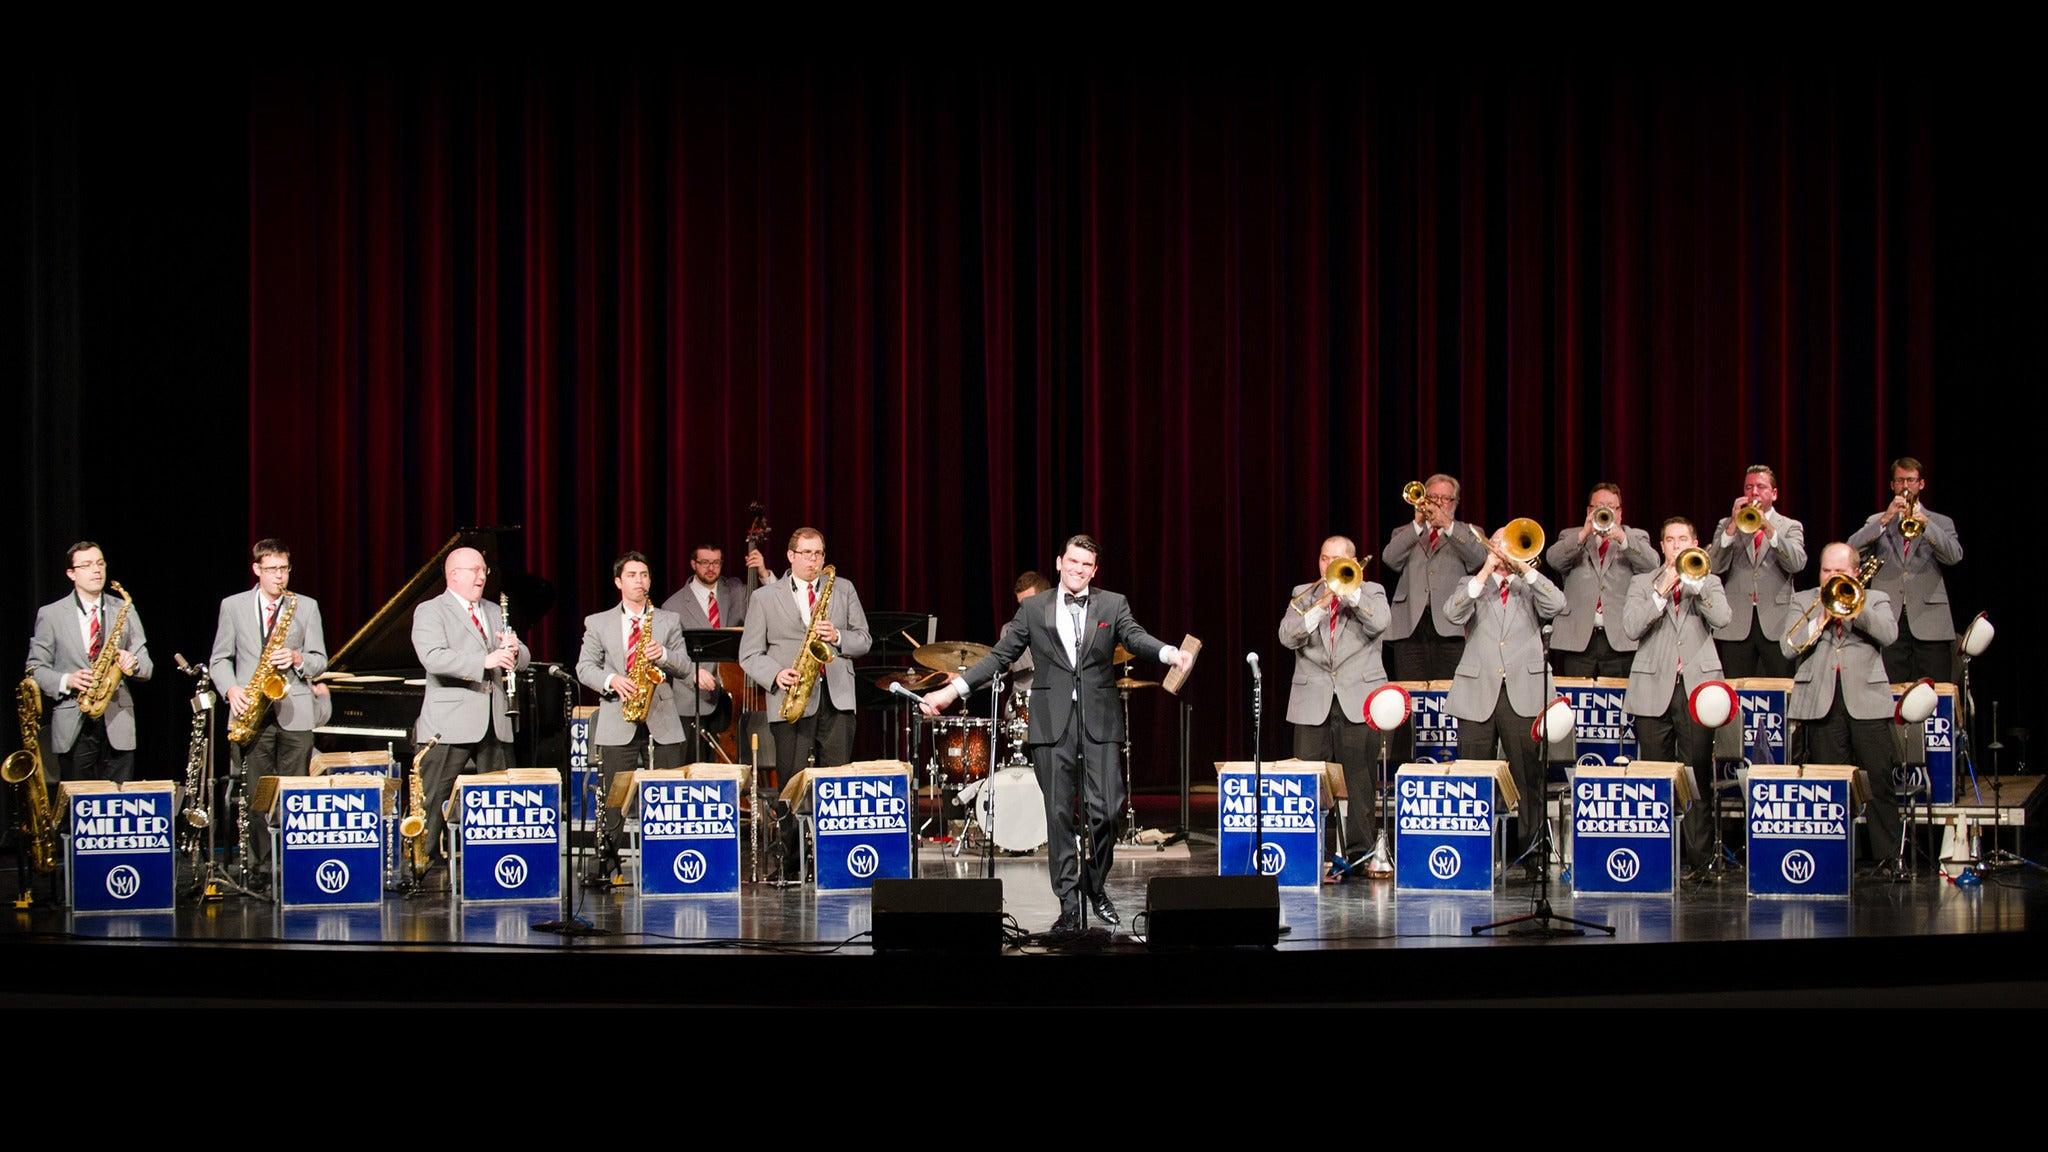 Glenn Miller Orchestra at Paramount Theatre